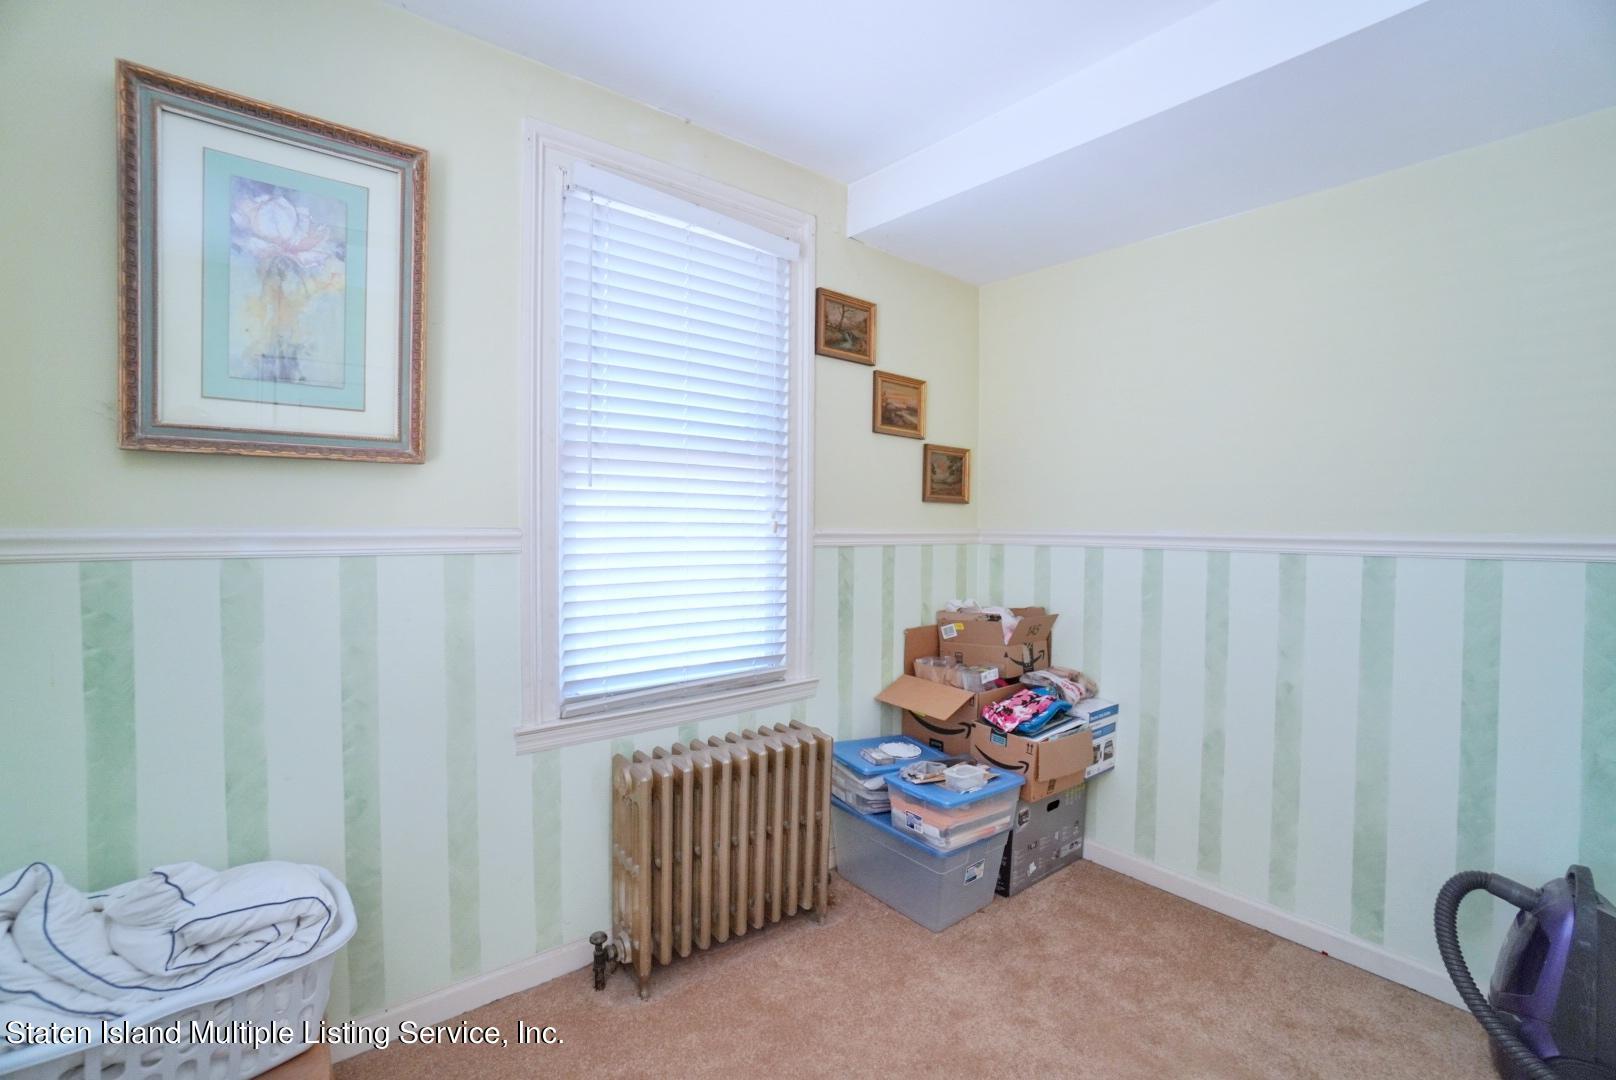 Single Family - Detached 264 Fisher Avenue  Staten Island, NY 10307, MLS-1146898-34